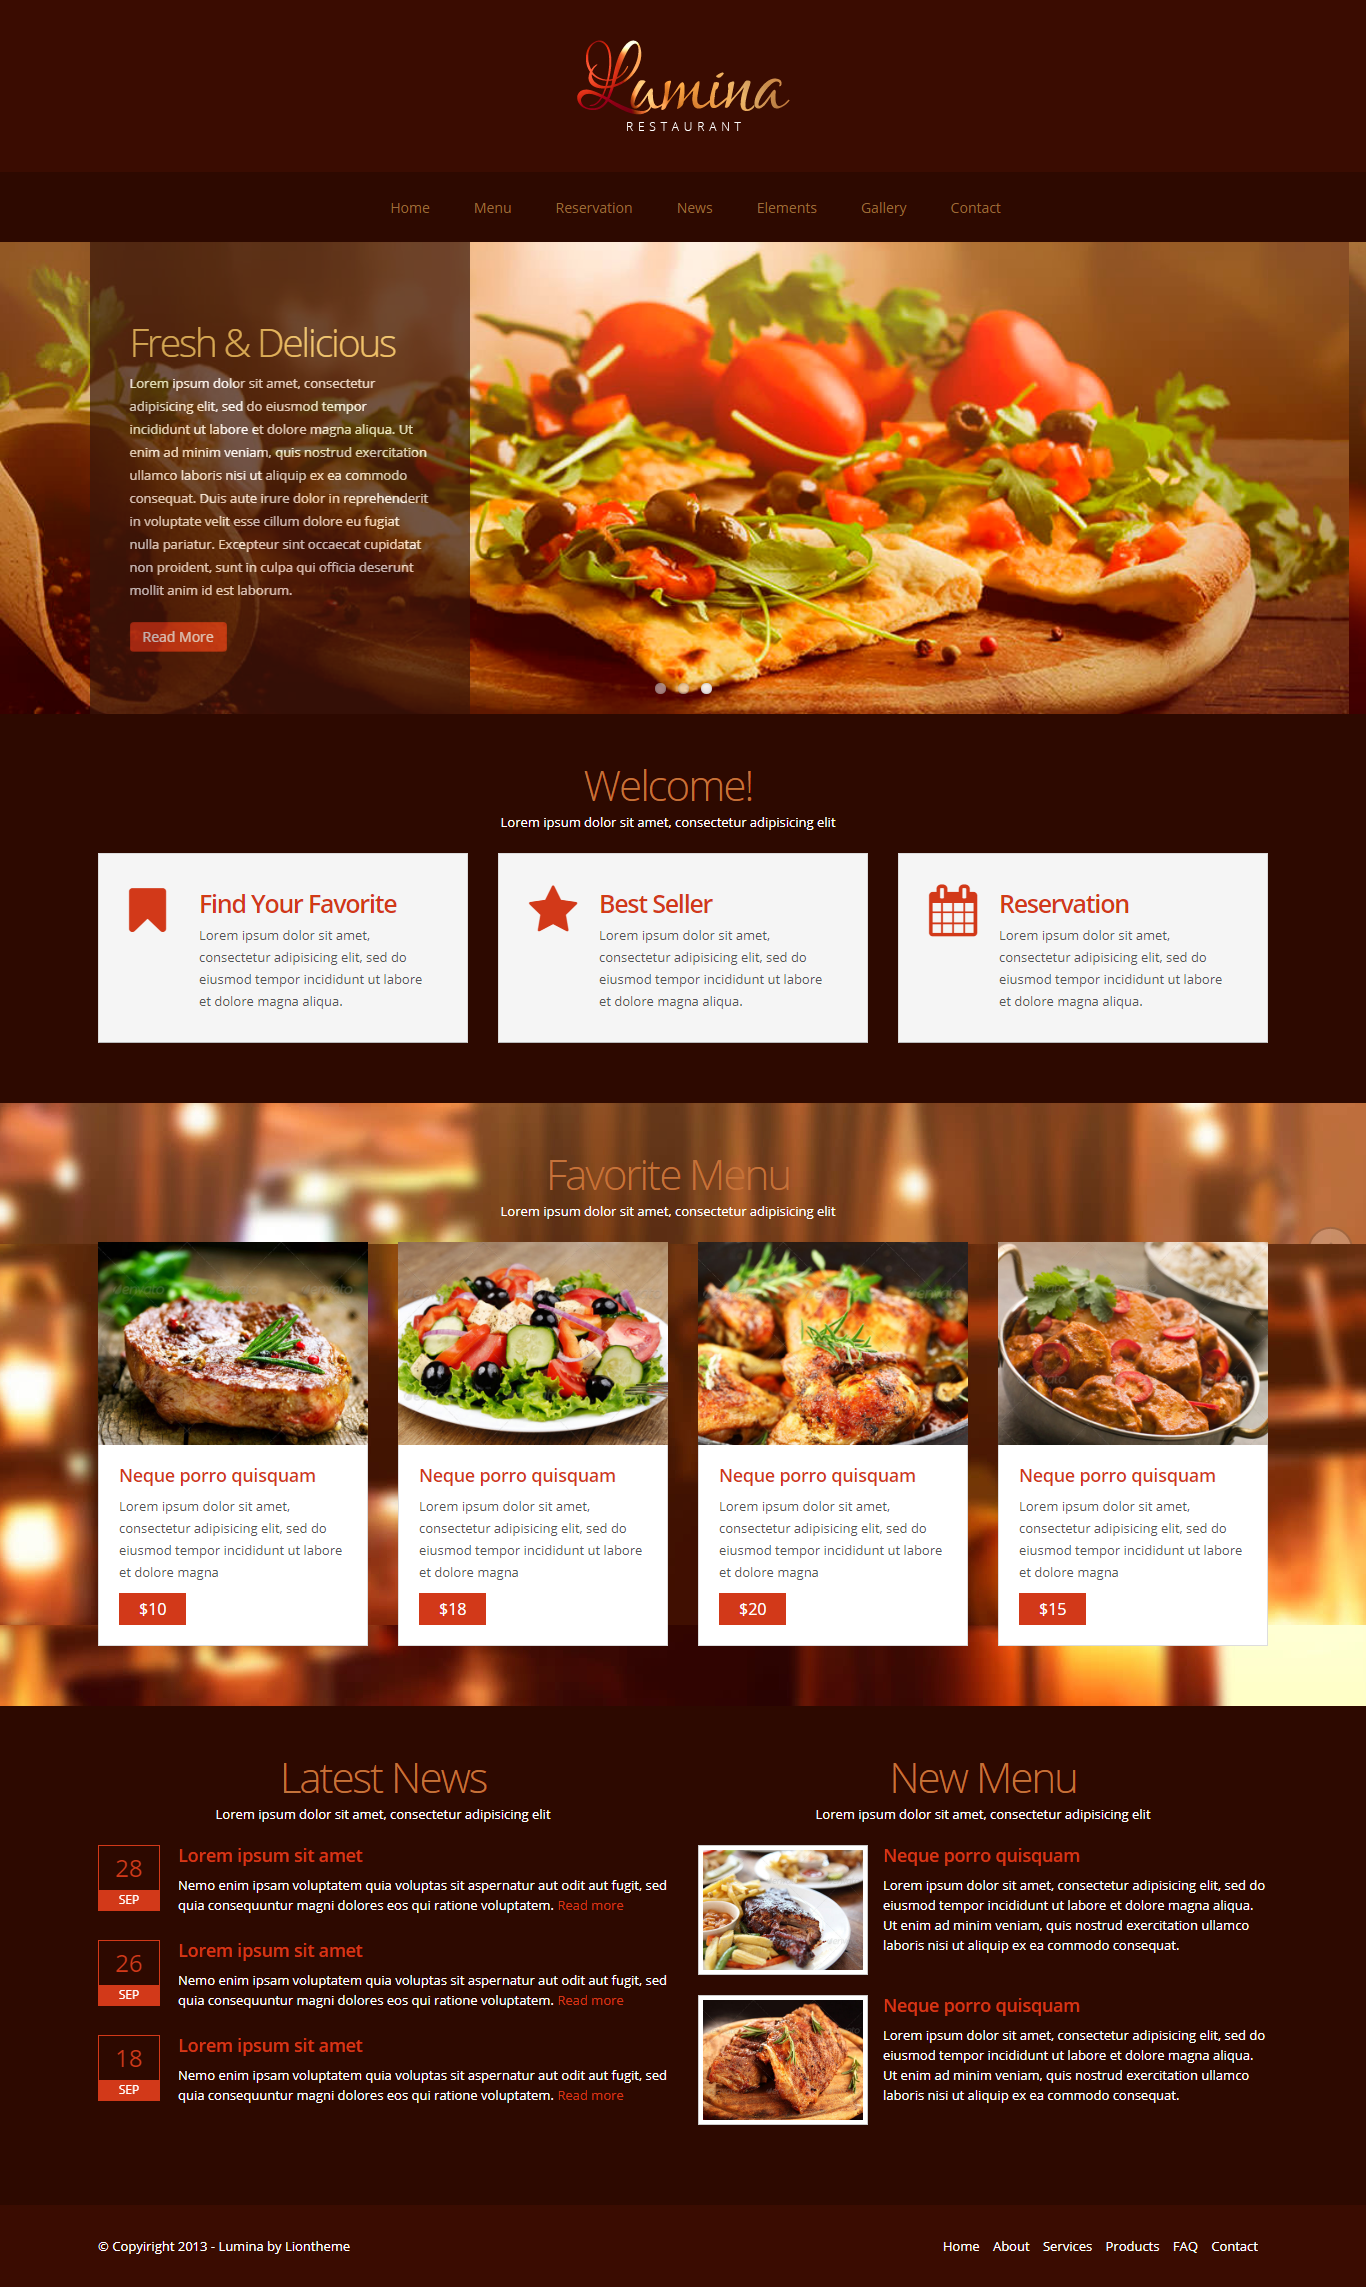 Lumina - Responsive Restaurant Website Template  #clean #clear #css3